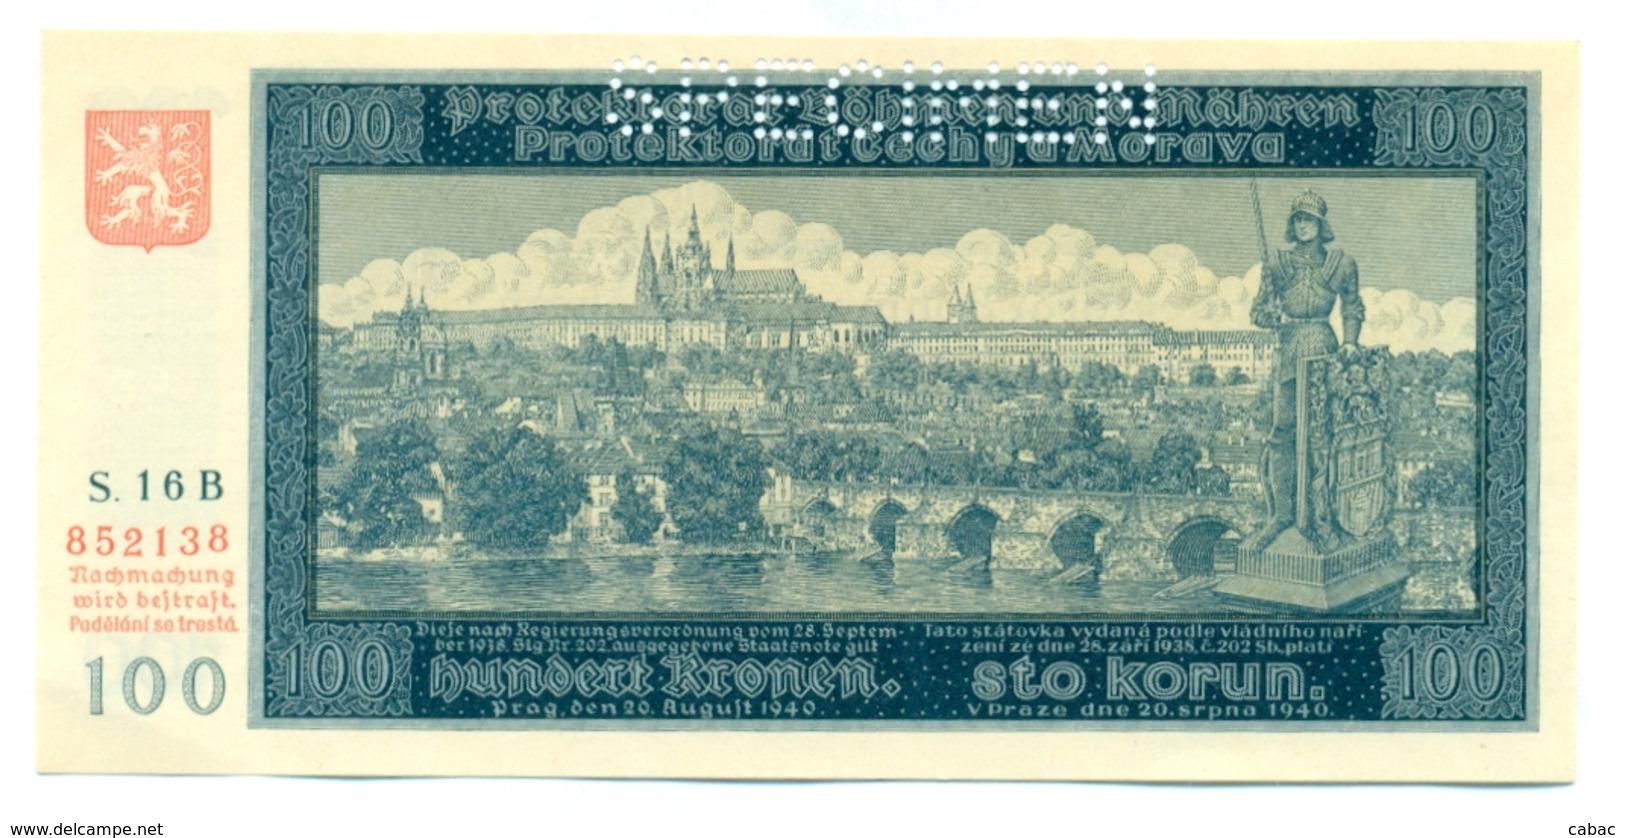 Hundert Kronen, Sto Korun, 100 Korun, PROTEKTORAT, 1940, SPECIMEN, Čechya Morava, S. 16B Bohemia Moravia - Tchécoslovaquie